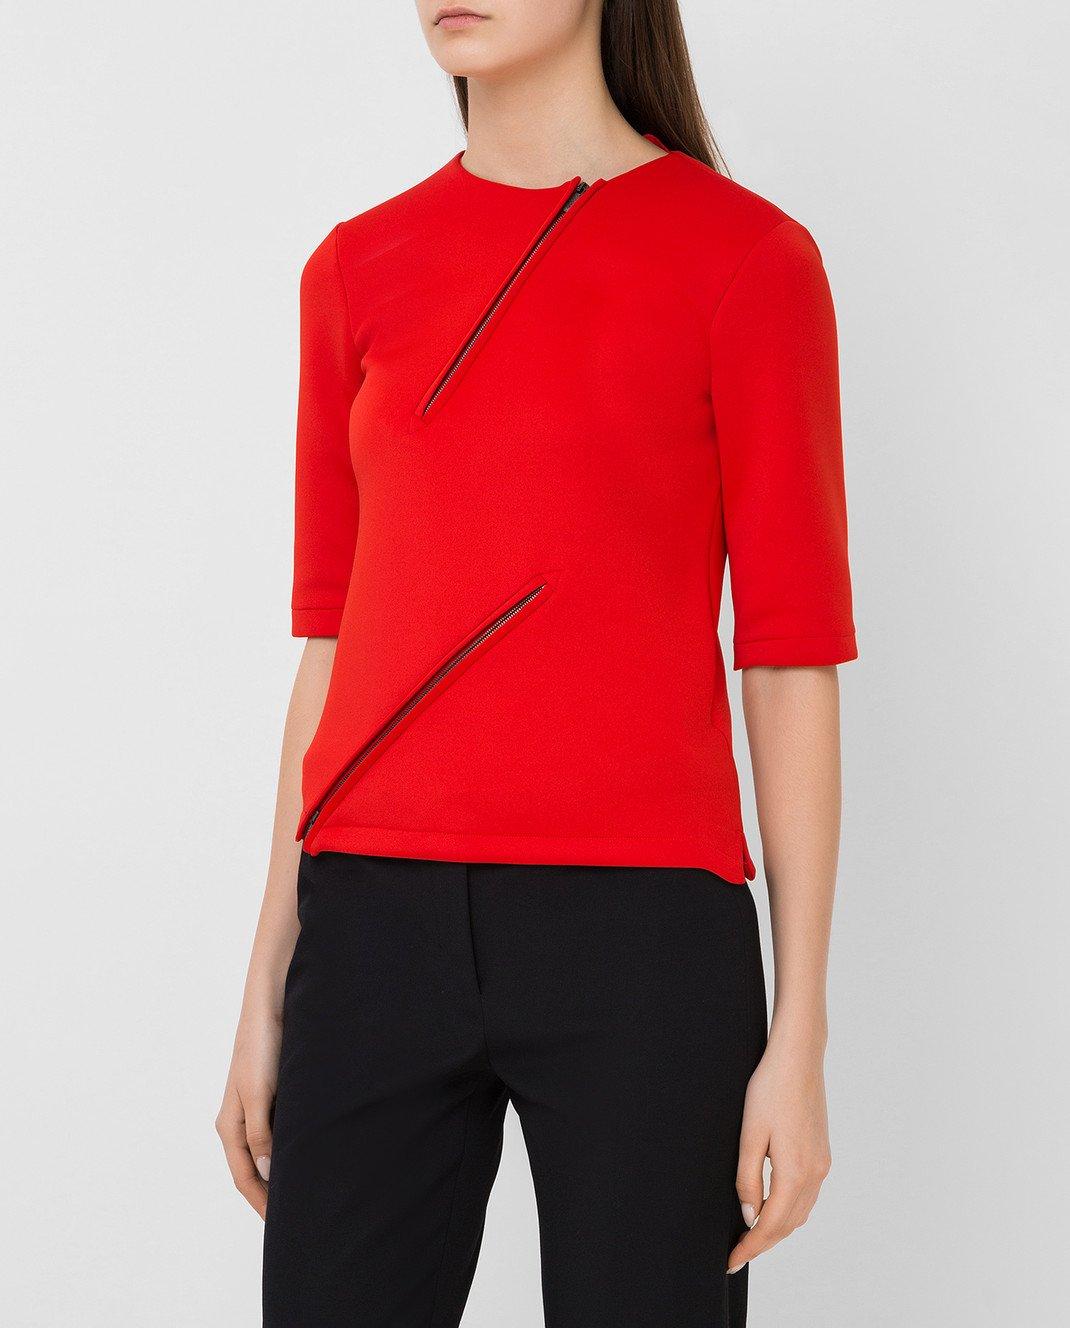 Bottega Veneta Красная футболка 405392 изображение 3